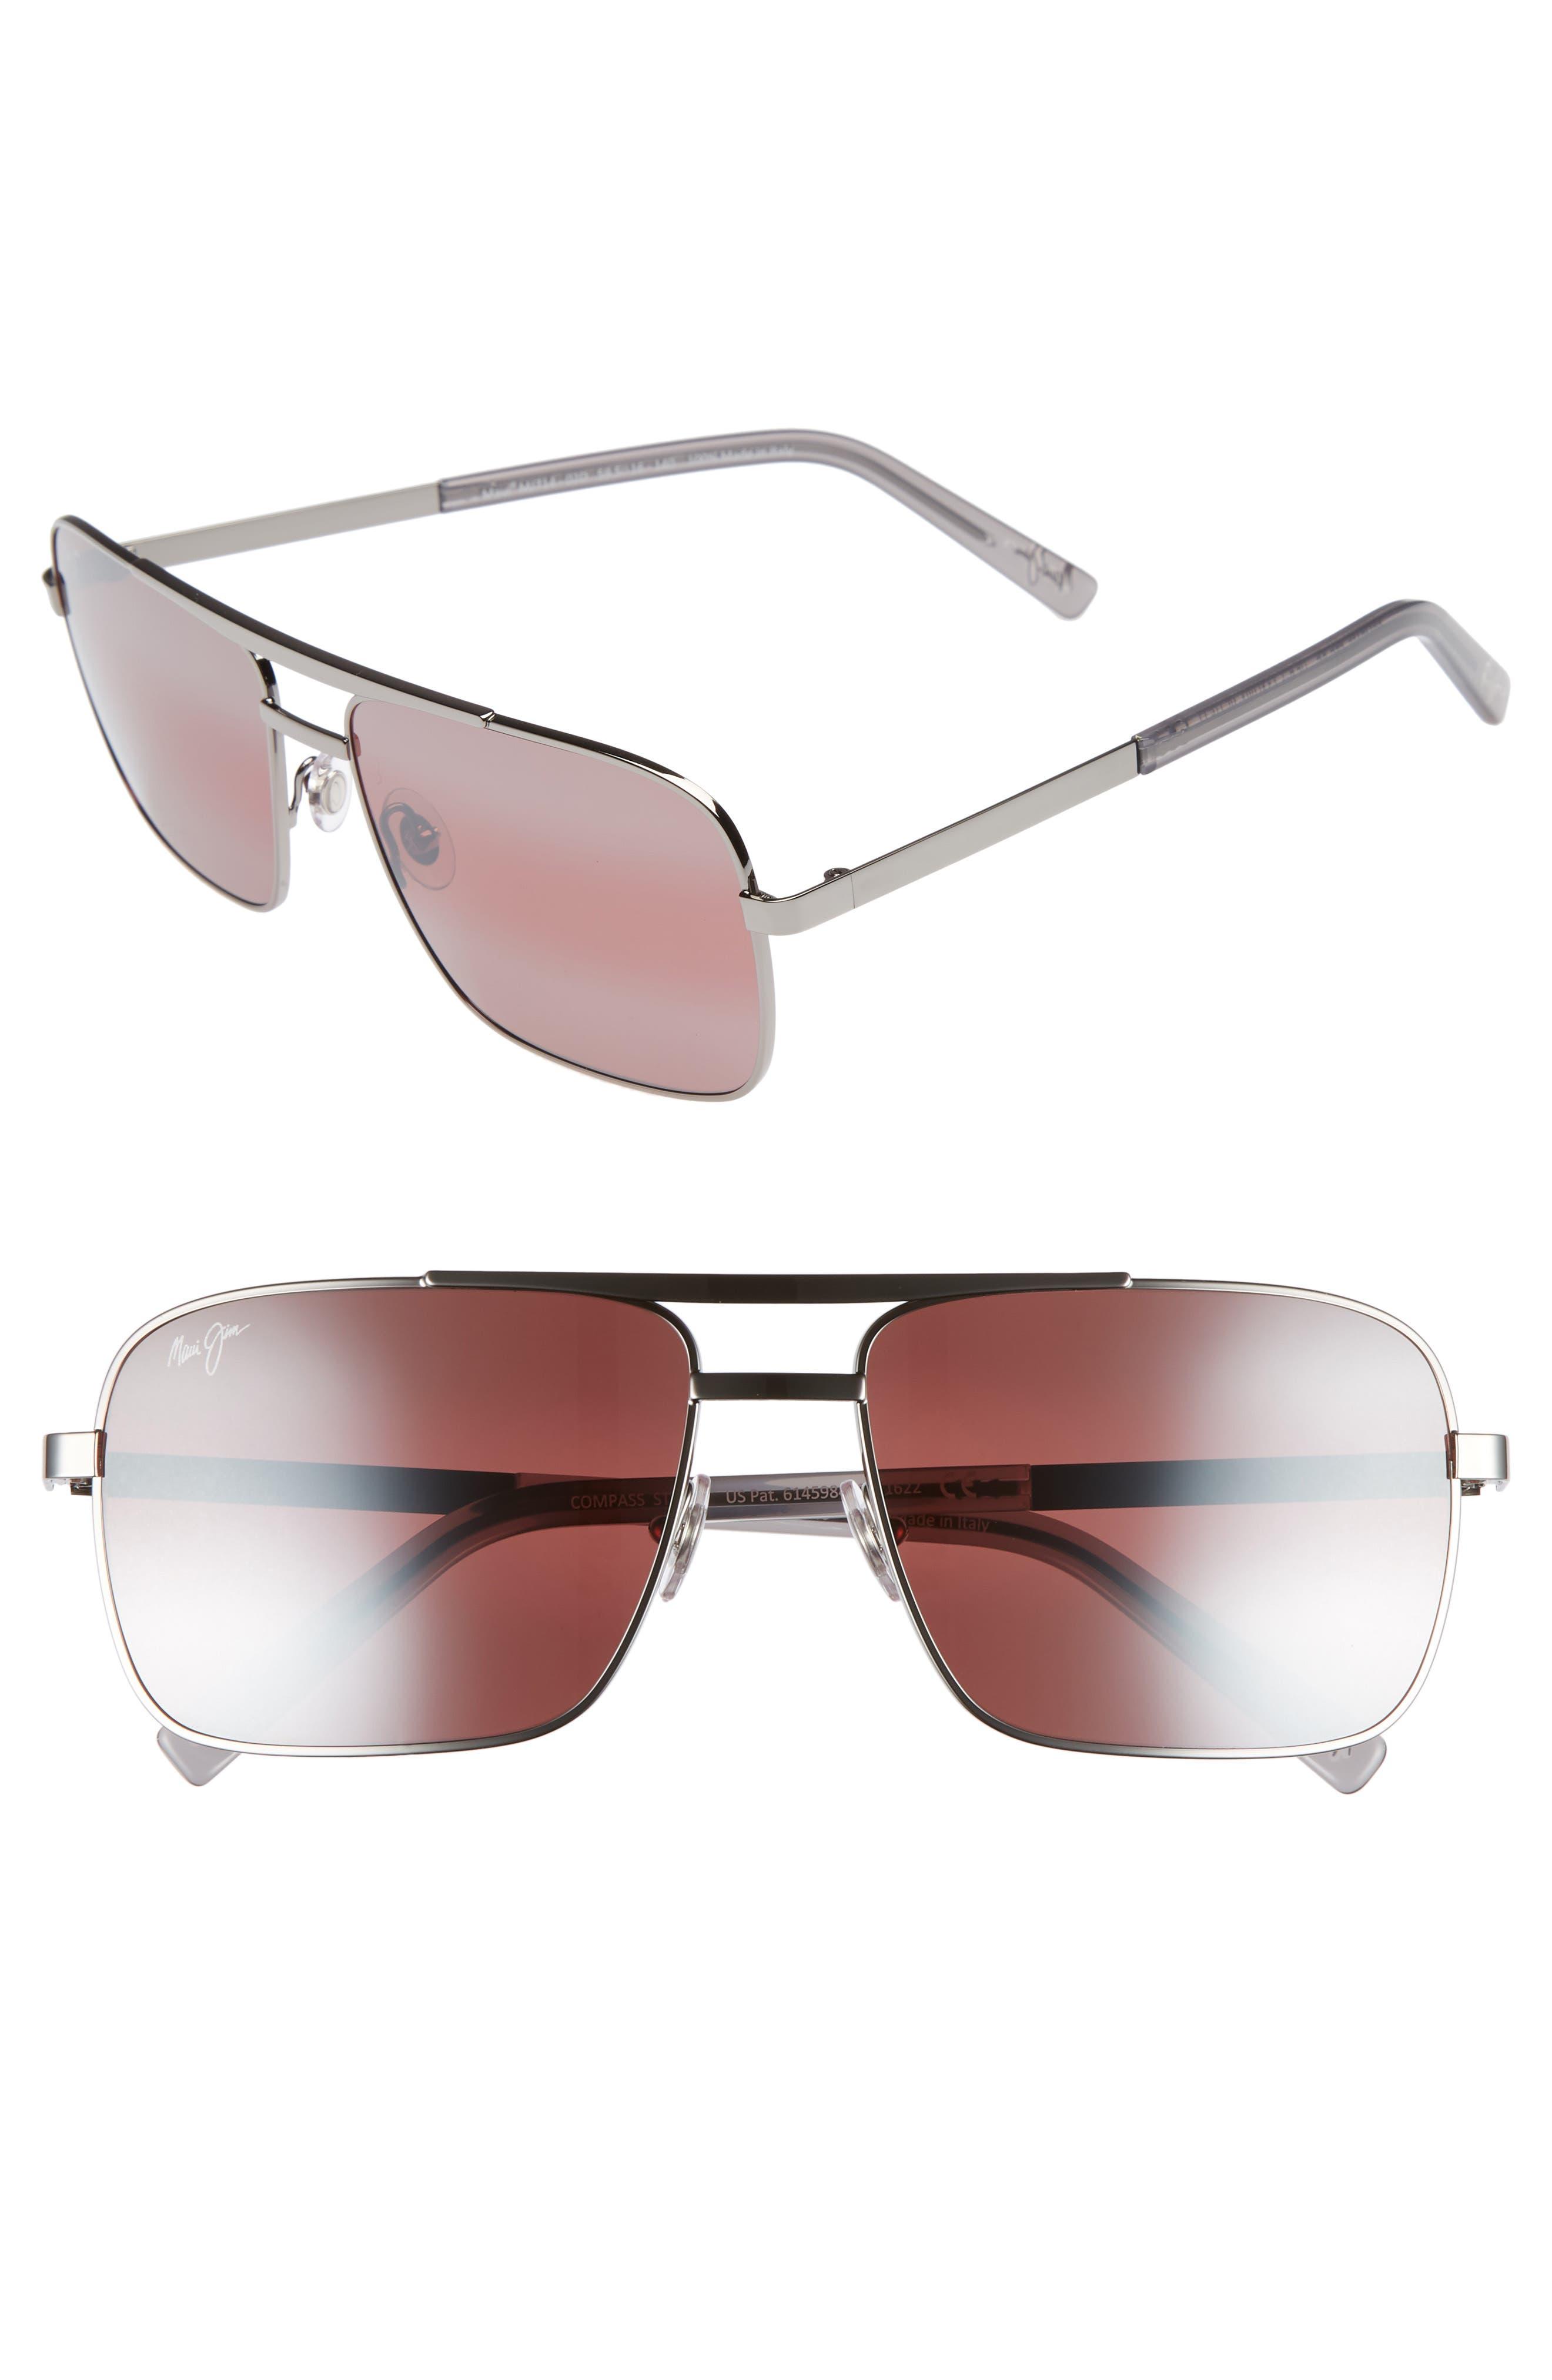 Compass 60mm Polarized Aviator Sunglasses,                             Main thumbnail 1, color,                             Silver/ Neutral Grey